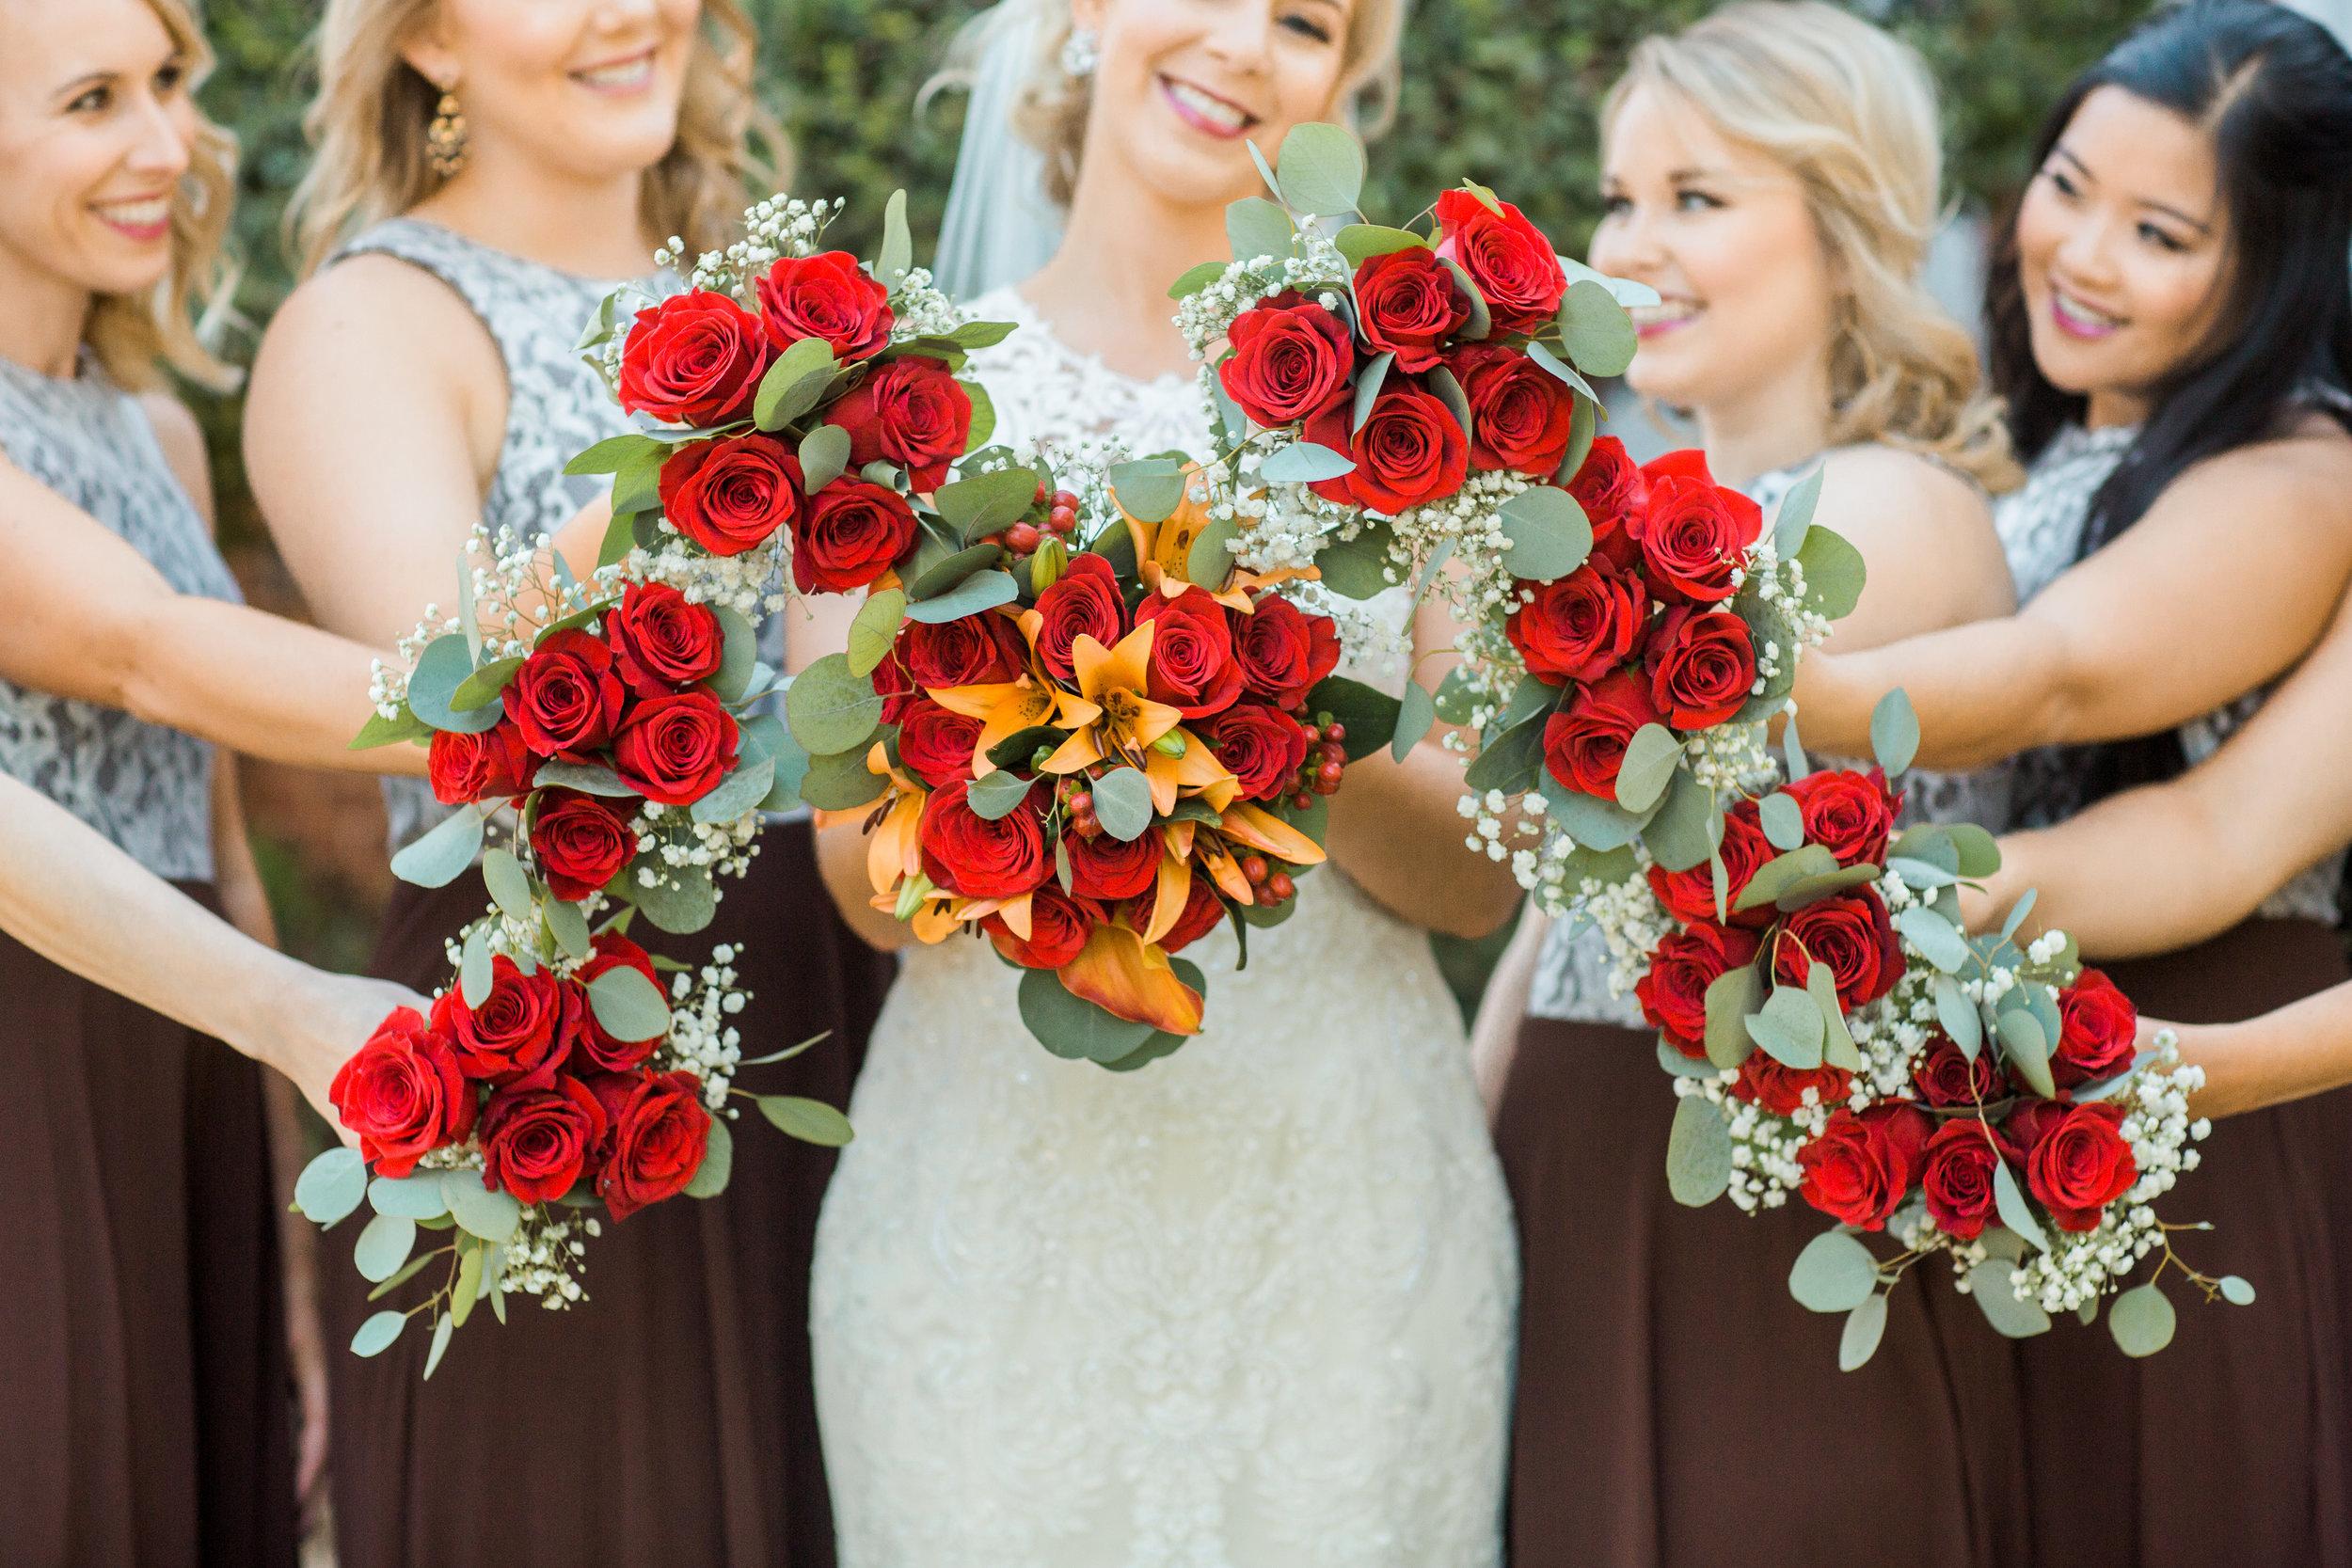 Bailey-Nathan-Windthorst-Texas-Wedding-020.jpg